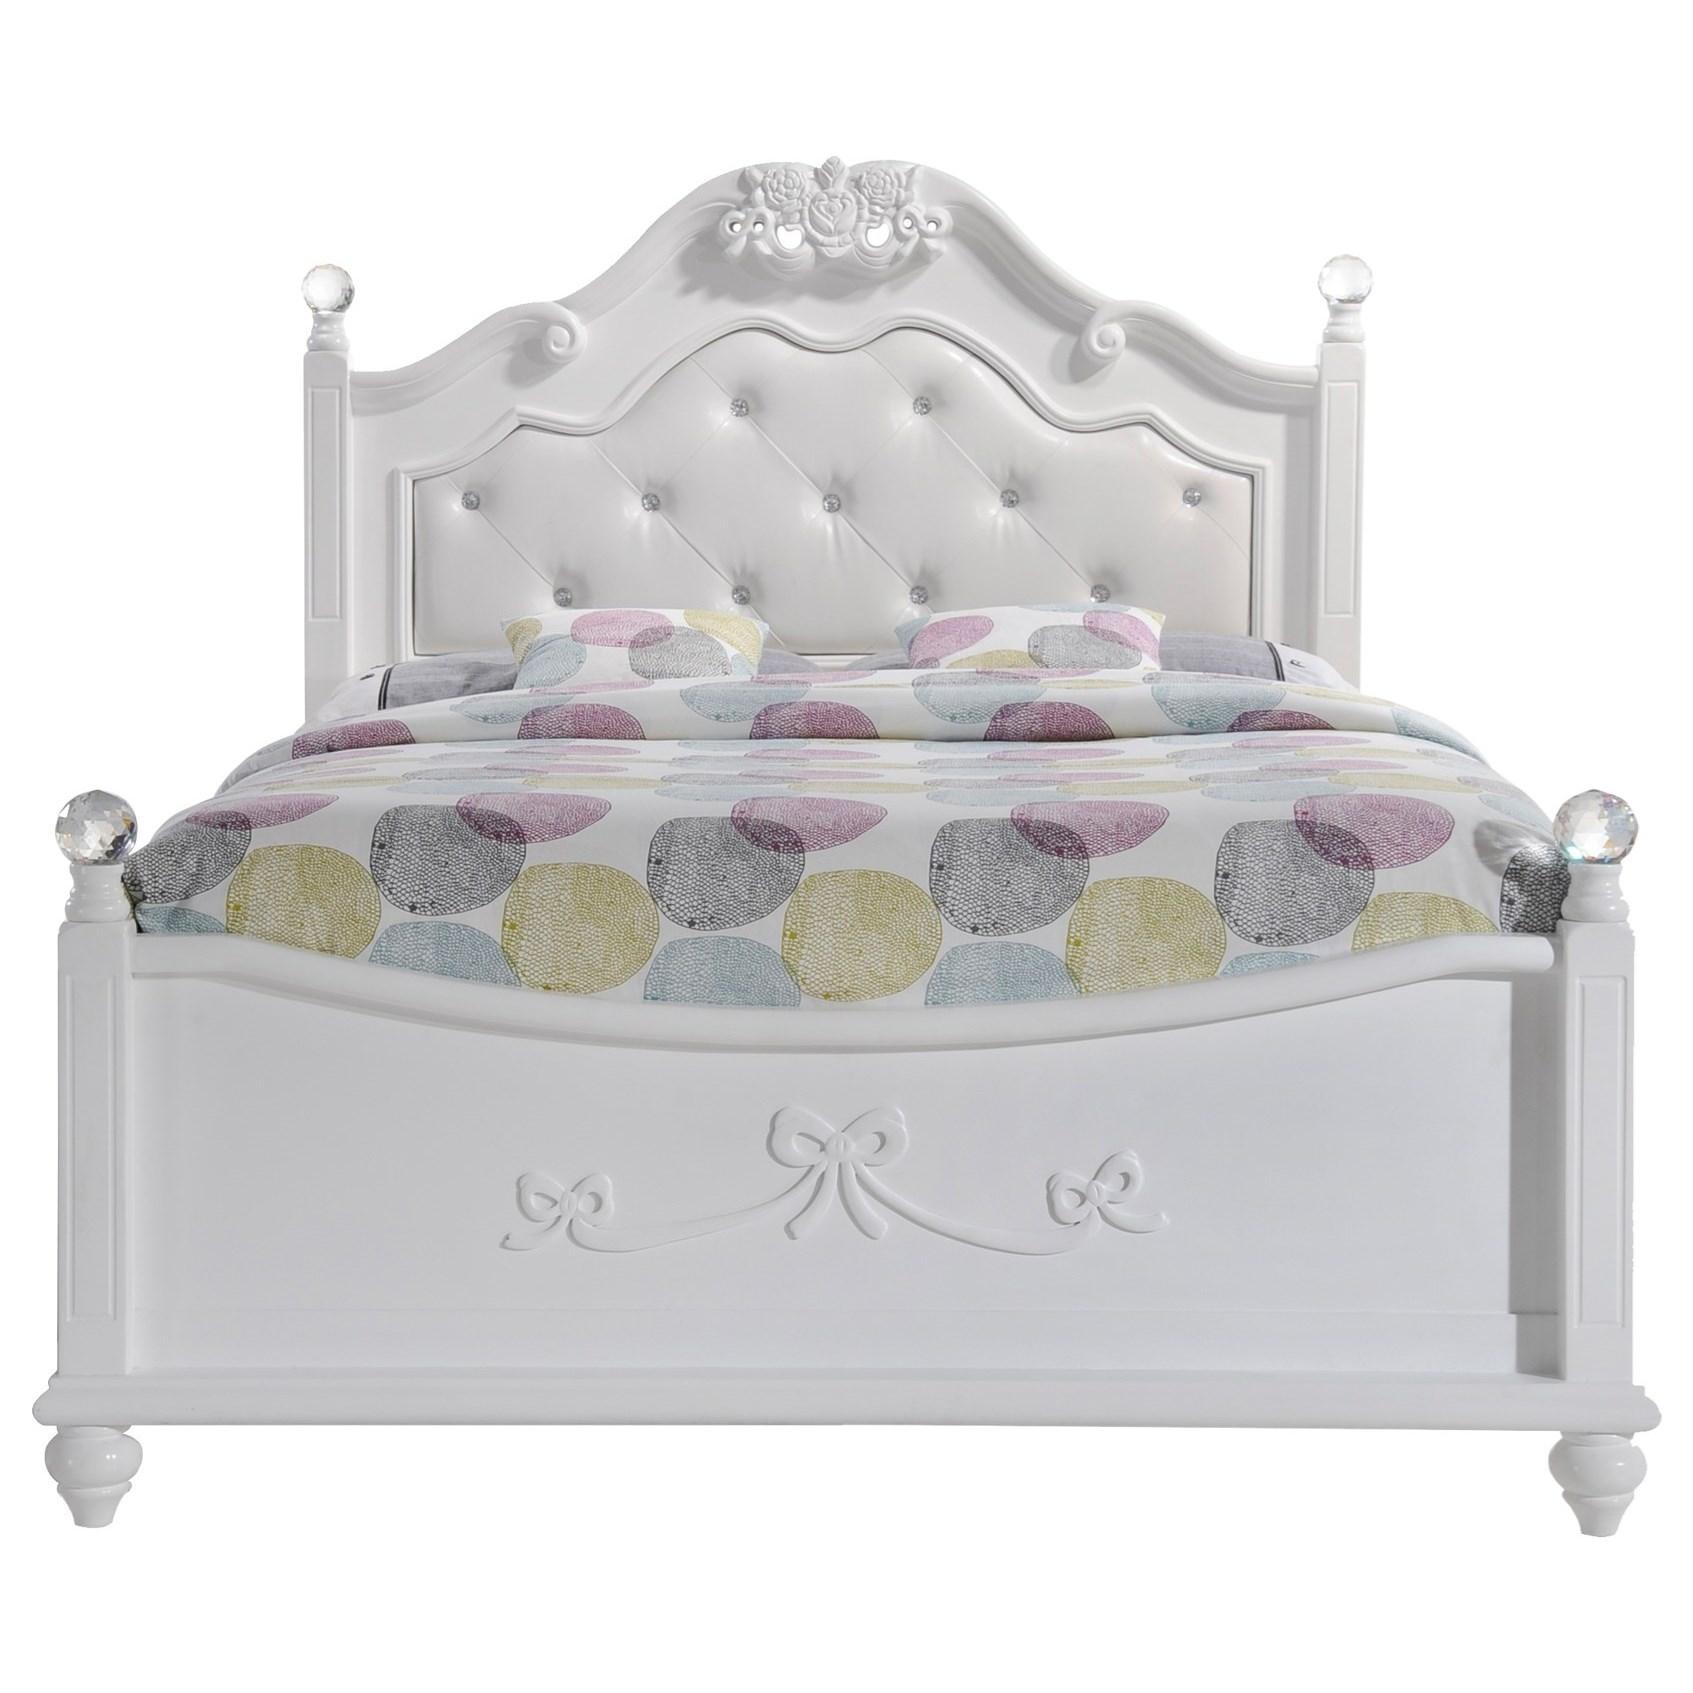 Alana Full Platform Bed by Elements International at Beck's Furniture